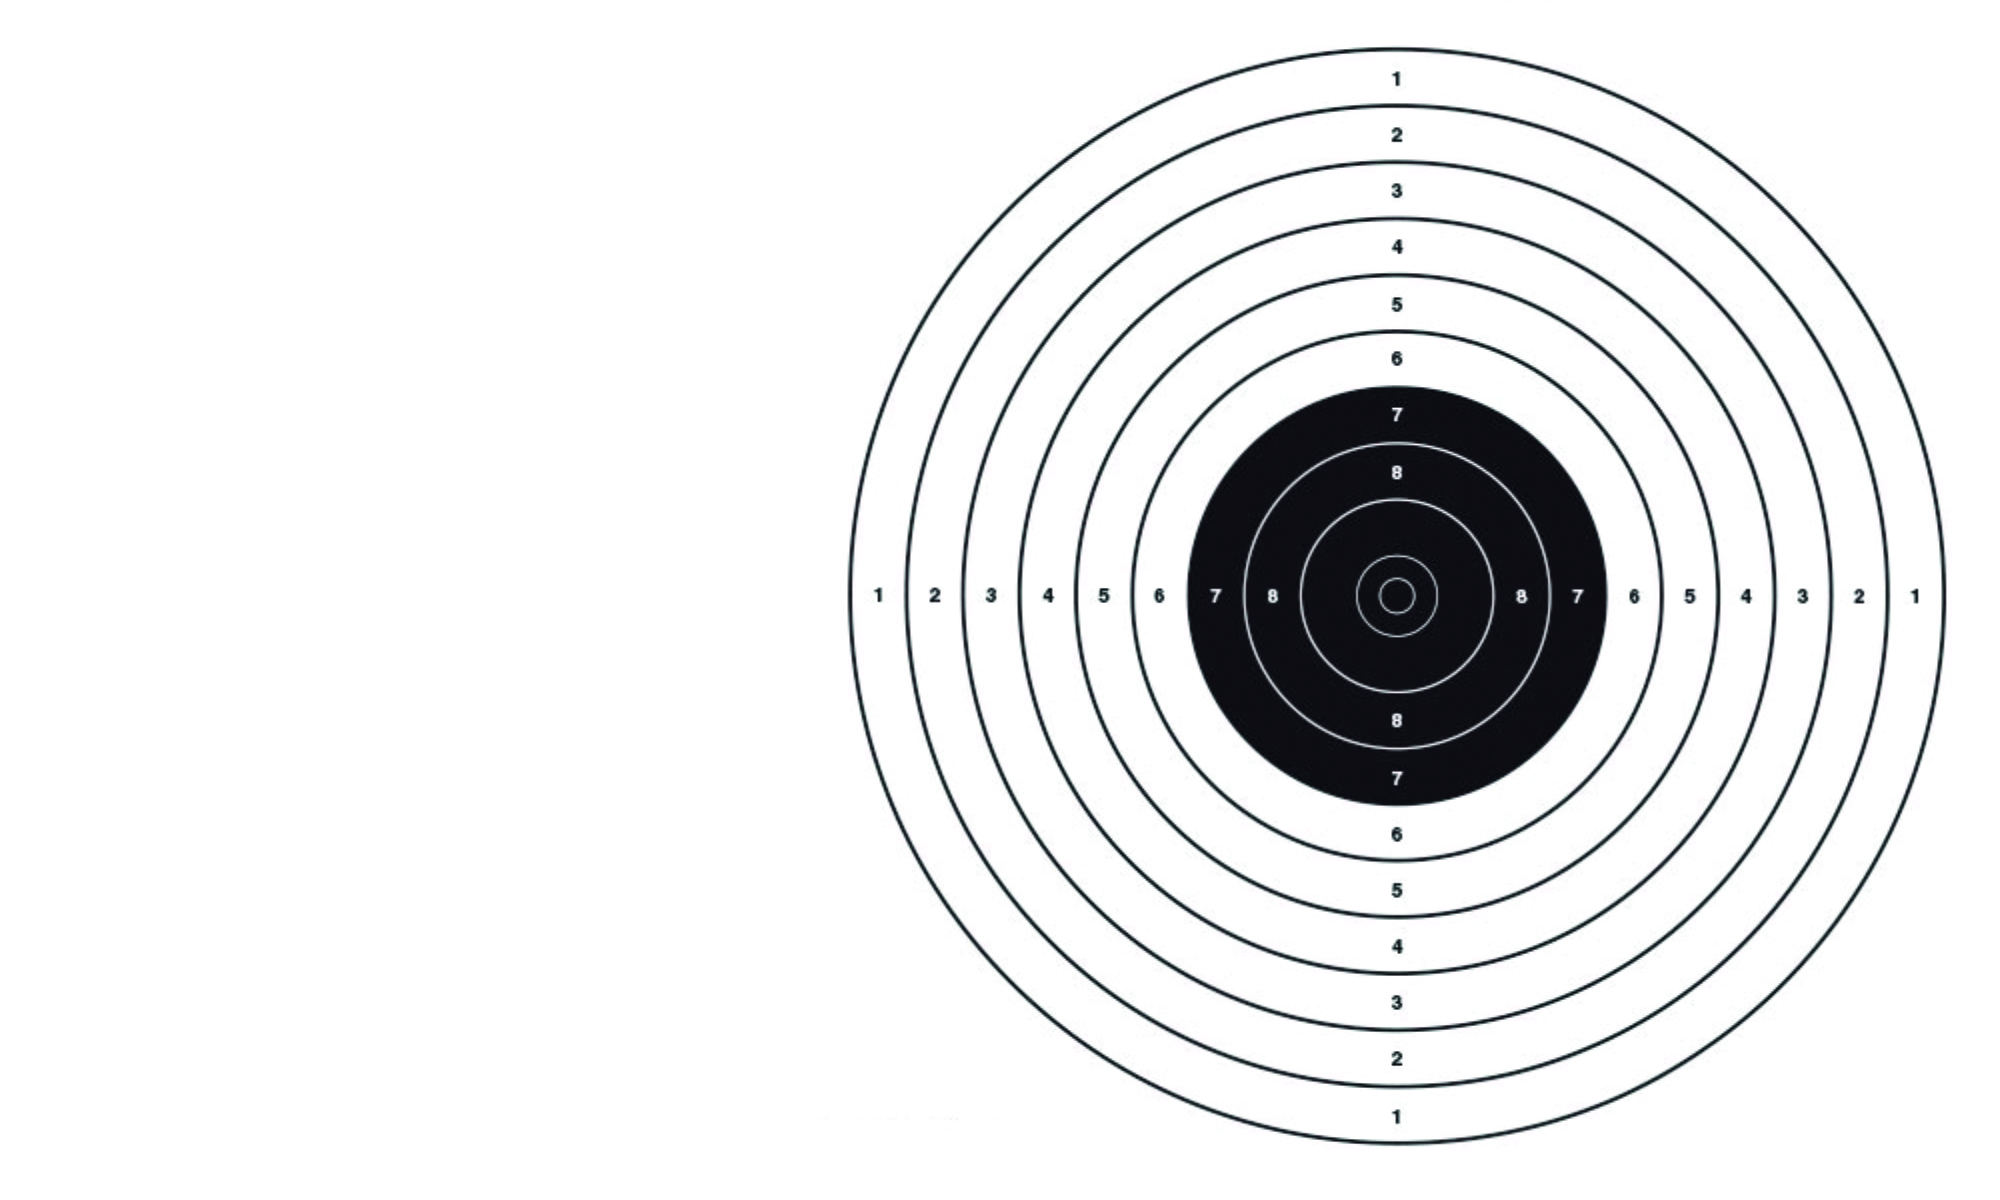 Ampumaurheilun Tulospalvelu